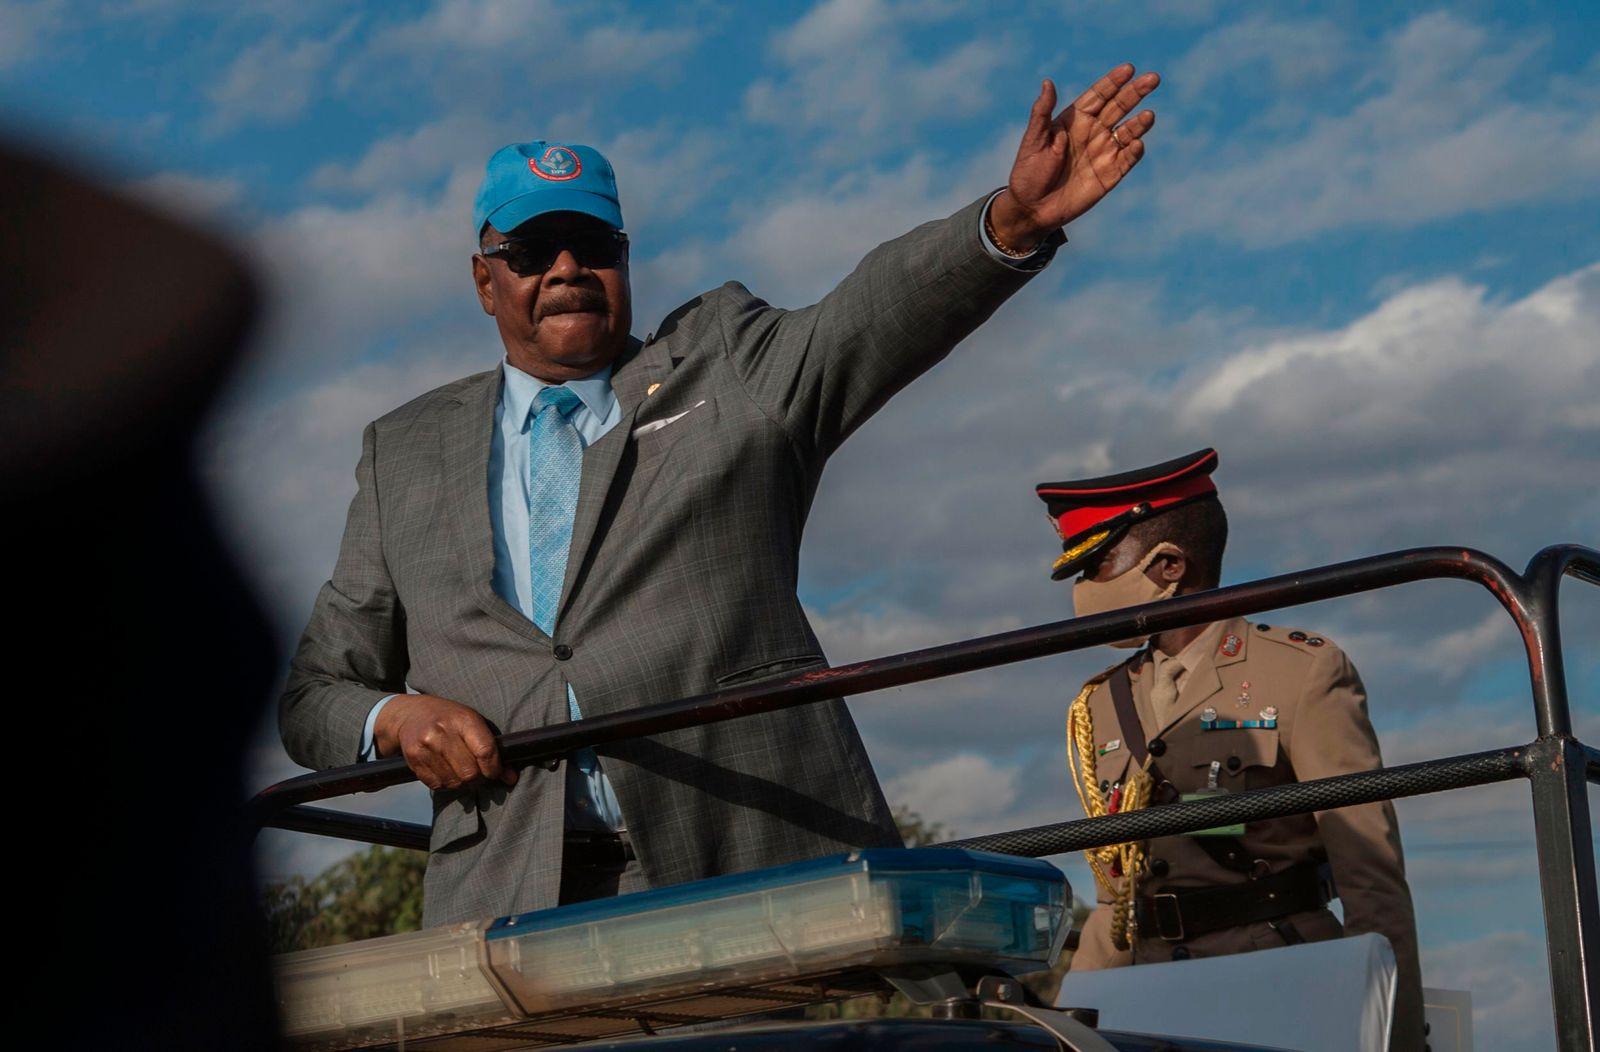 MALAWI-POLITICS-ELECTIONS